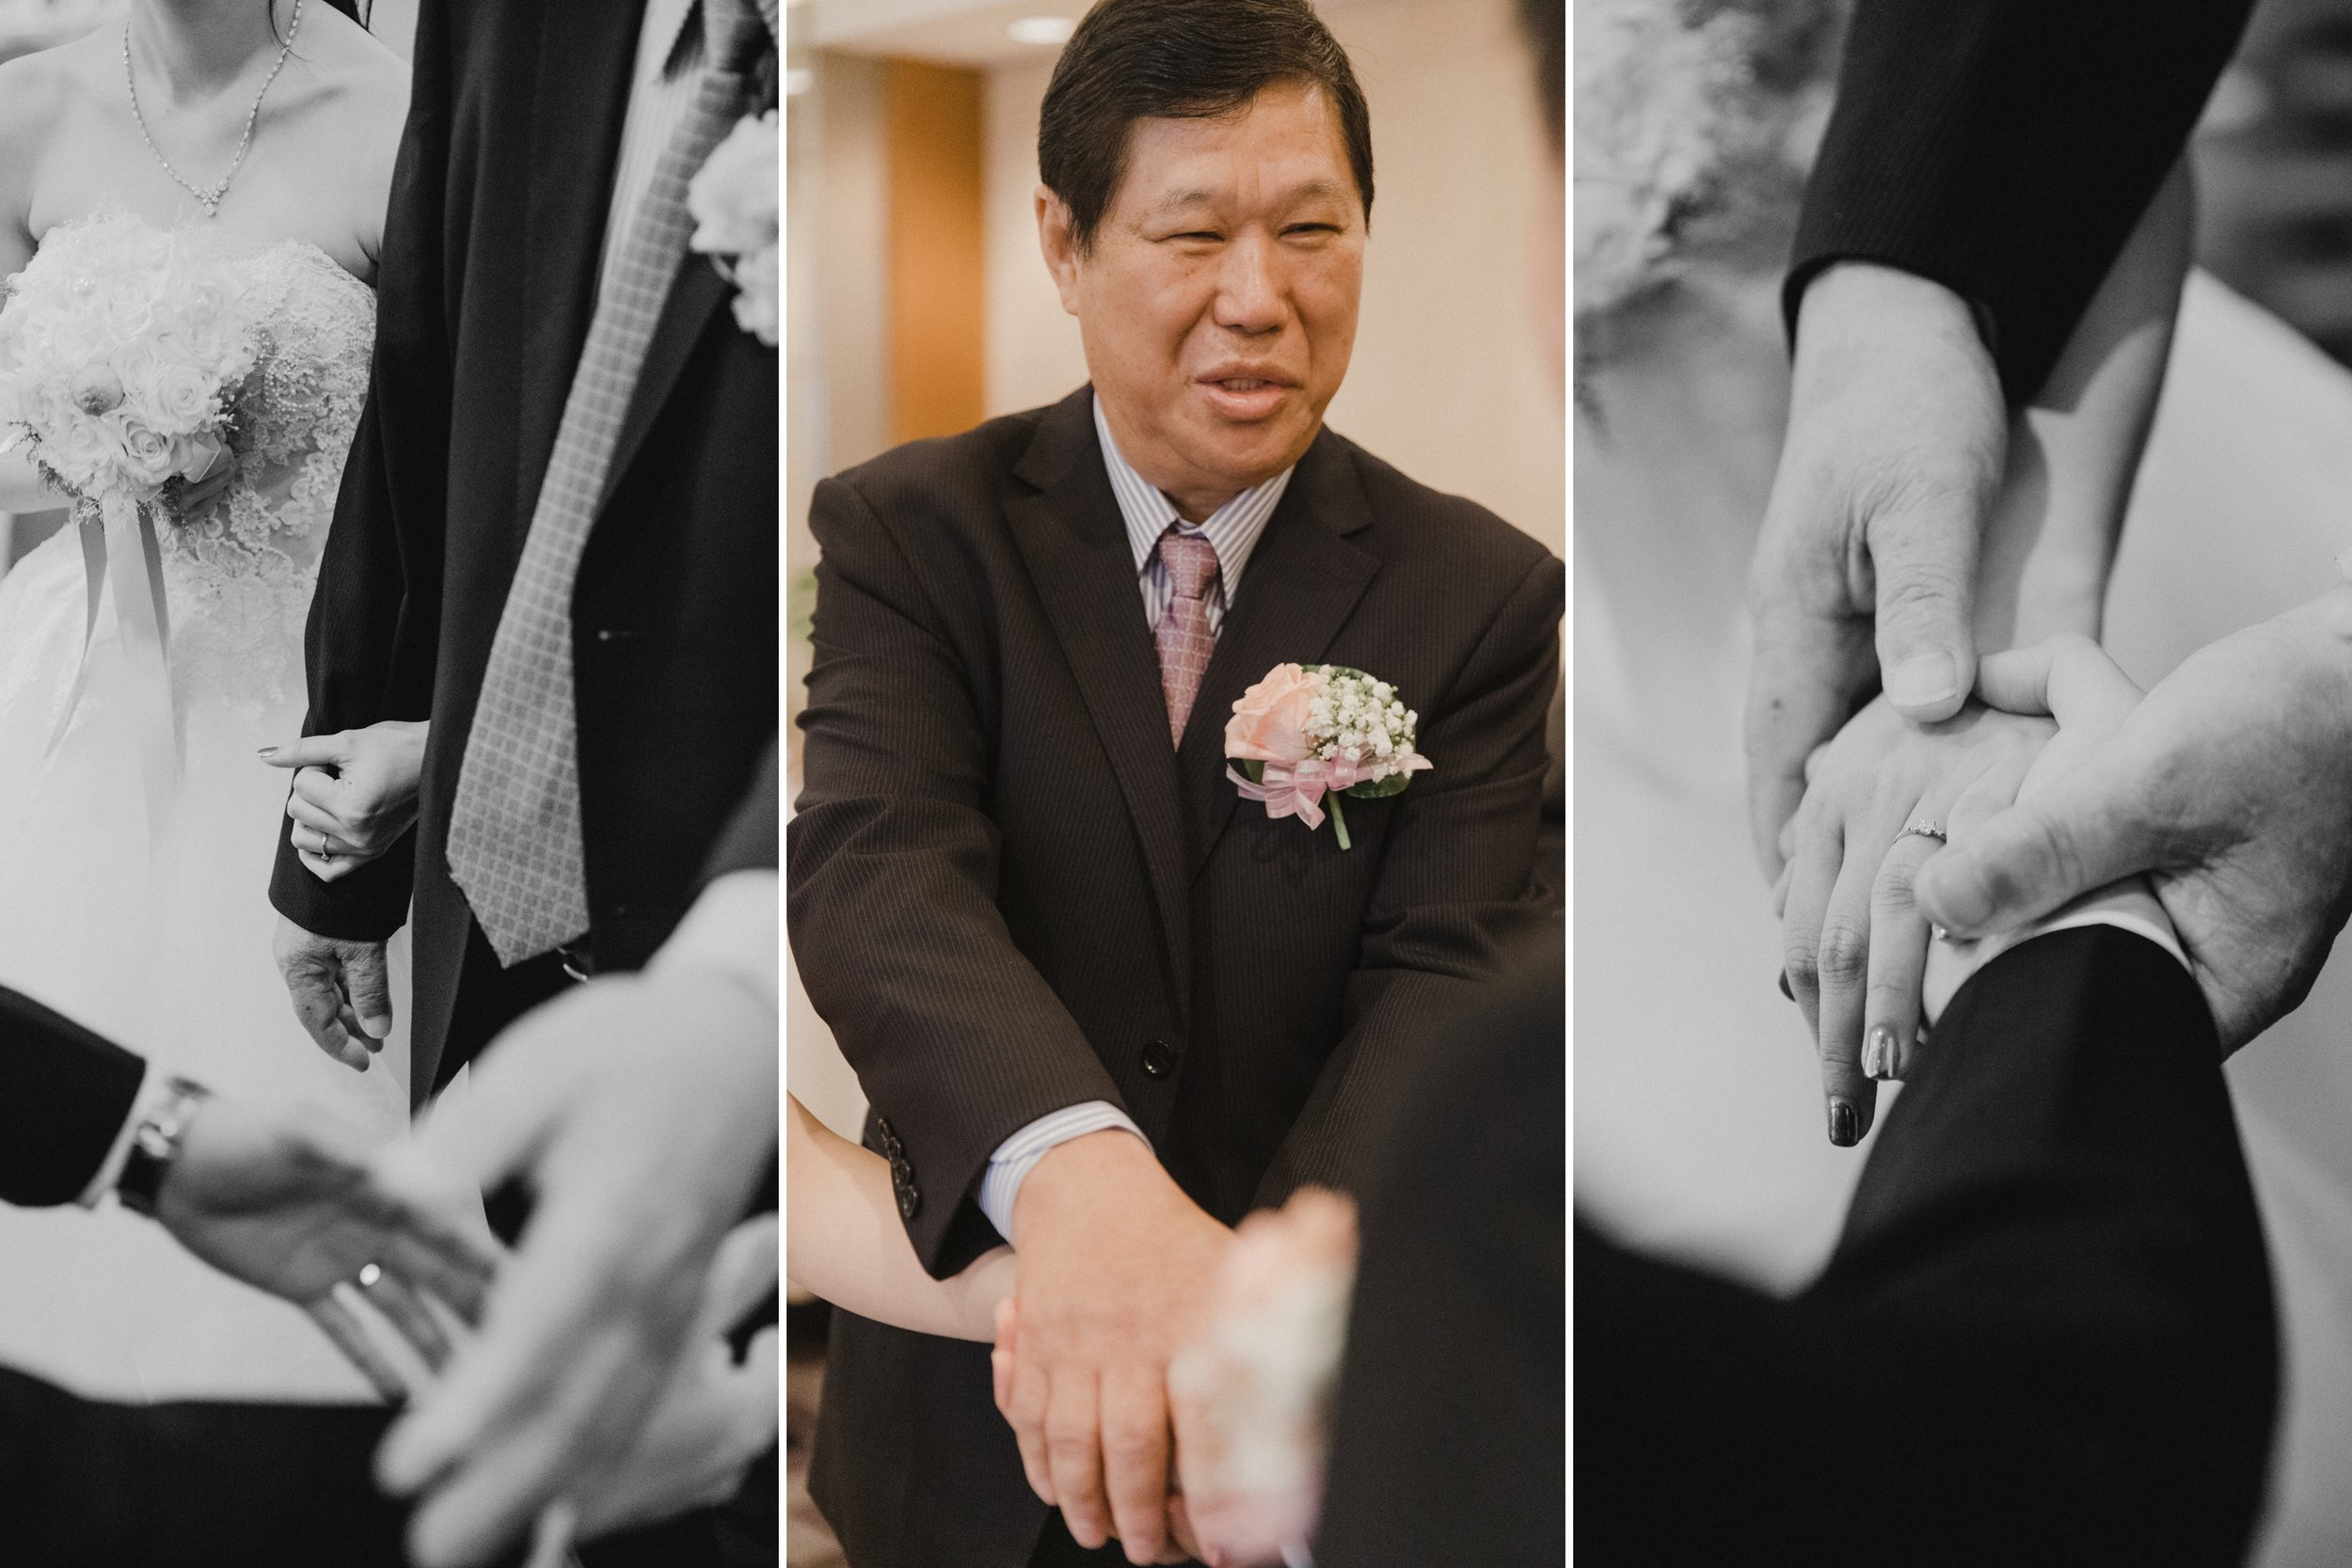 wedding-caridee-oscar-lunch-ambassador-hsinchu-結婚午宴-新竹國賓_35.jpg